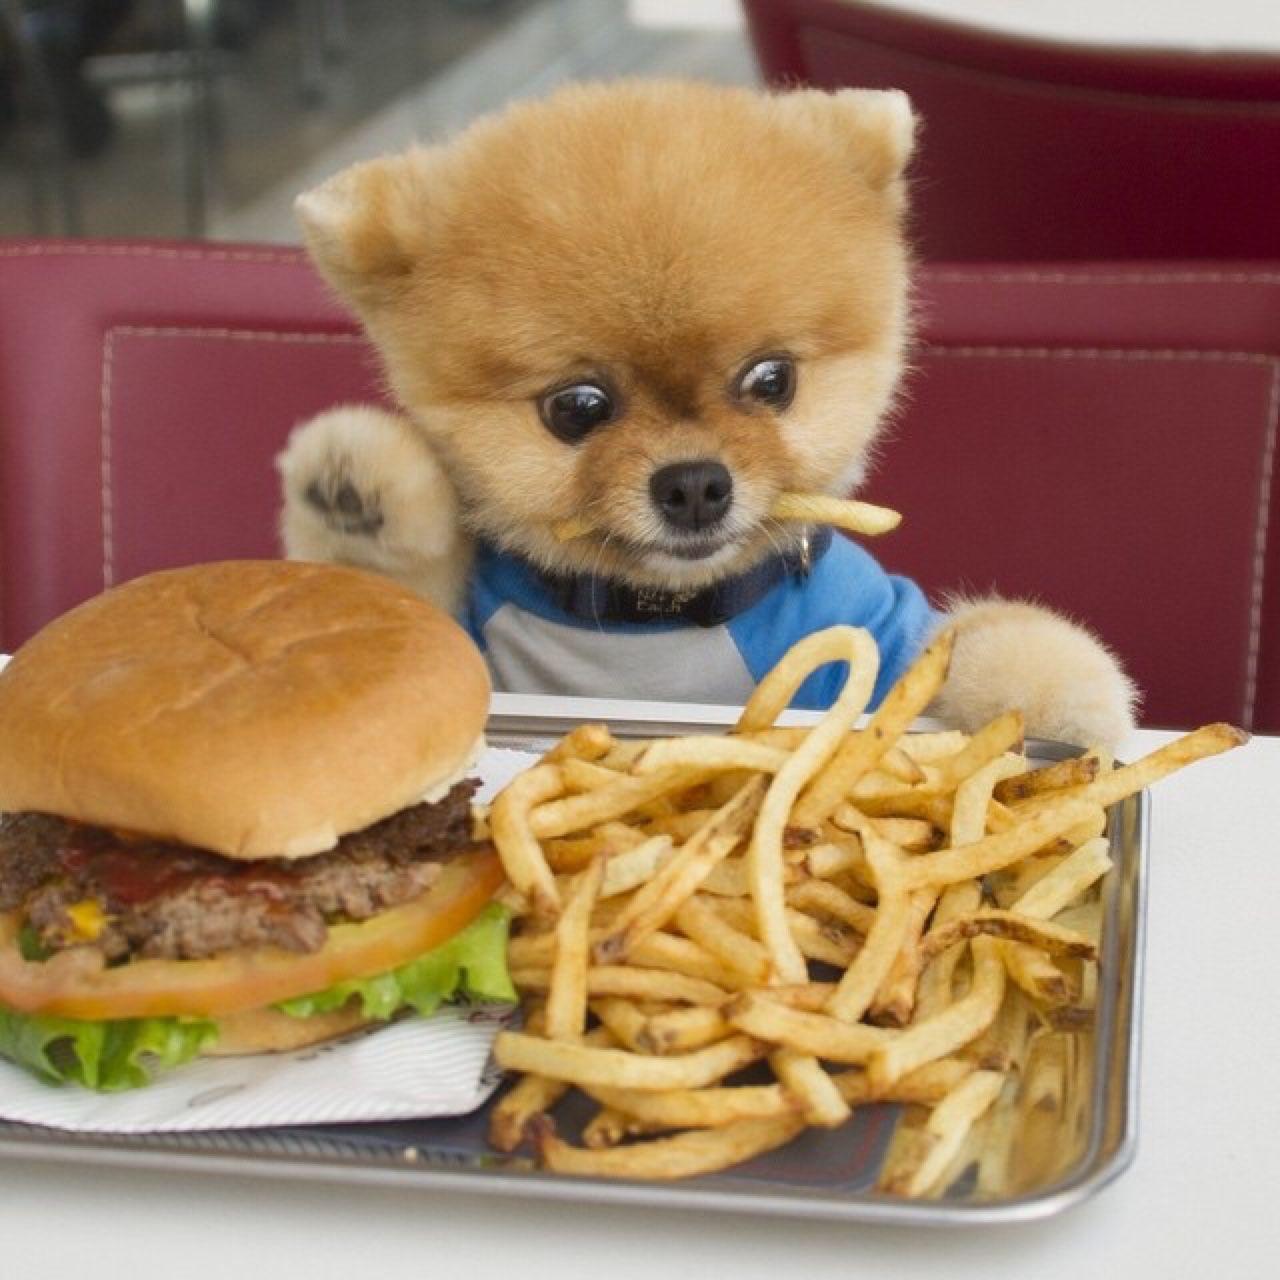 It's burger day for Jiff the Pomeranian. - 귀여운 아기 동물, 애완동물 제품, 귀여운 강아지 - 웹